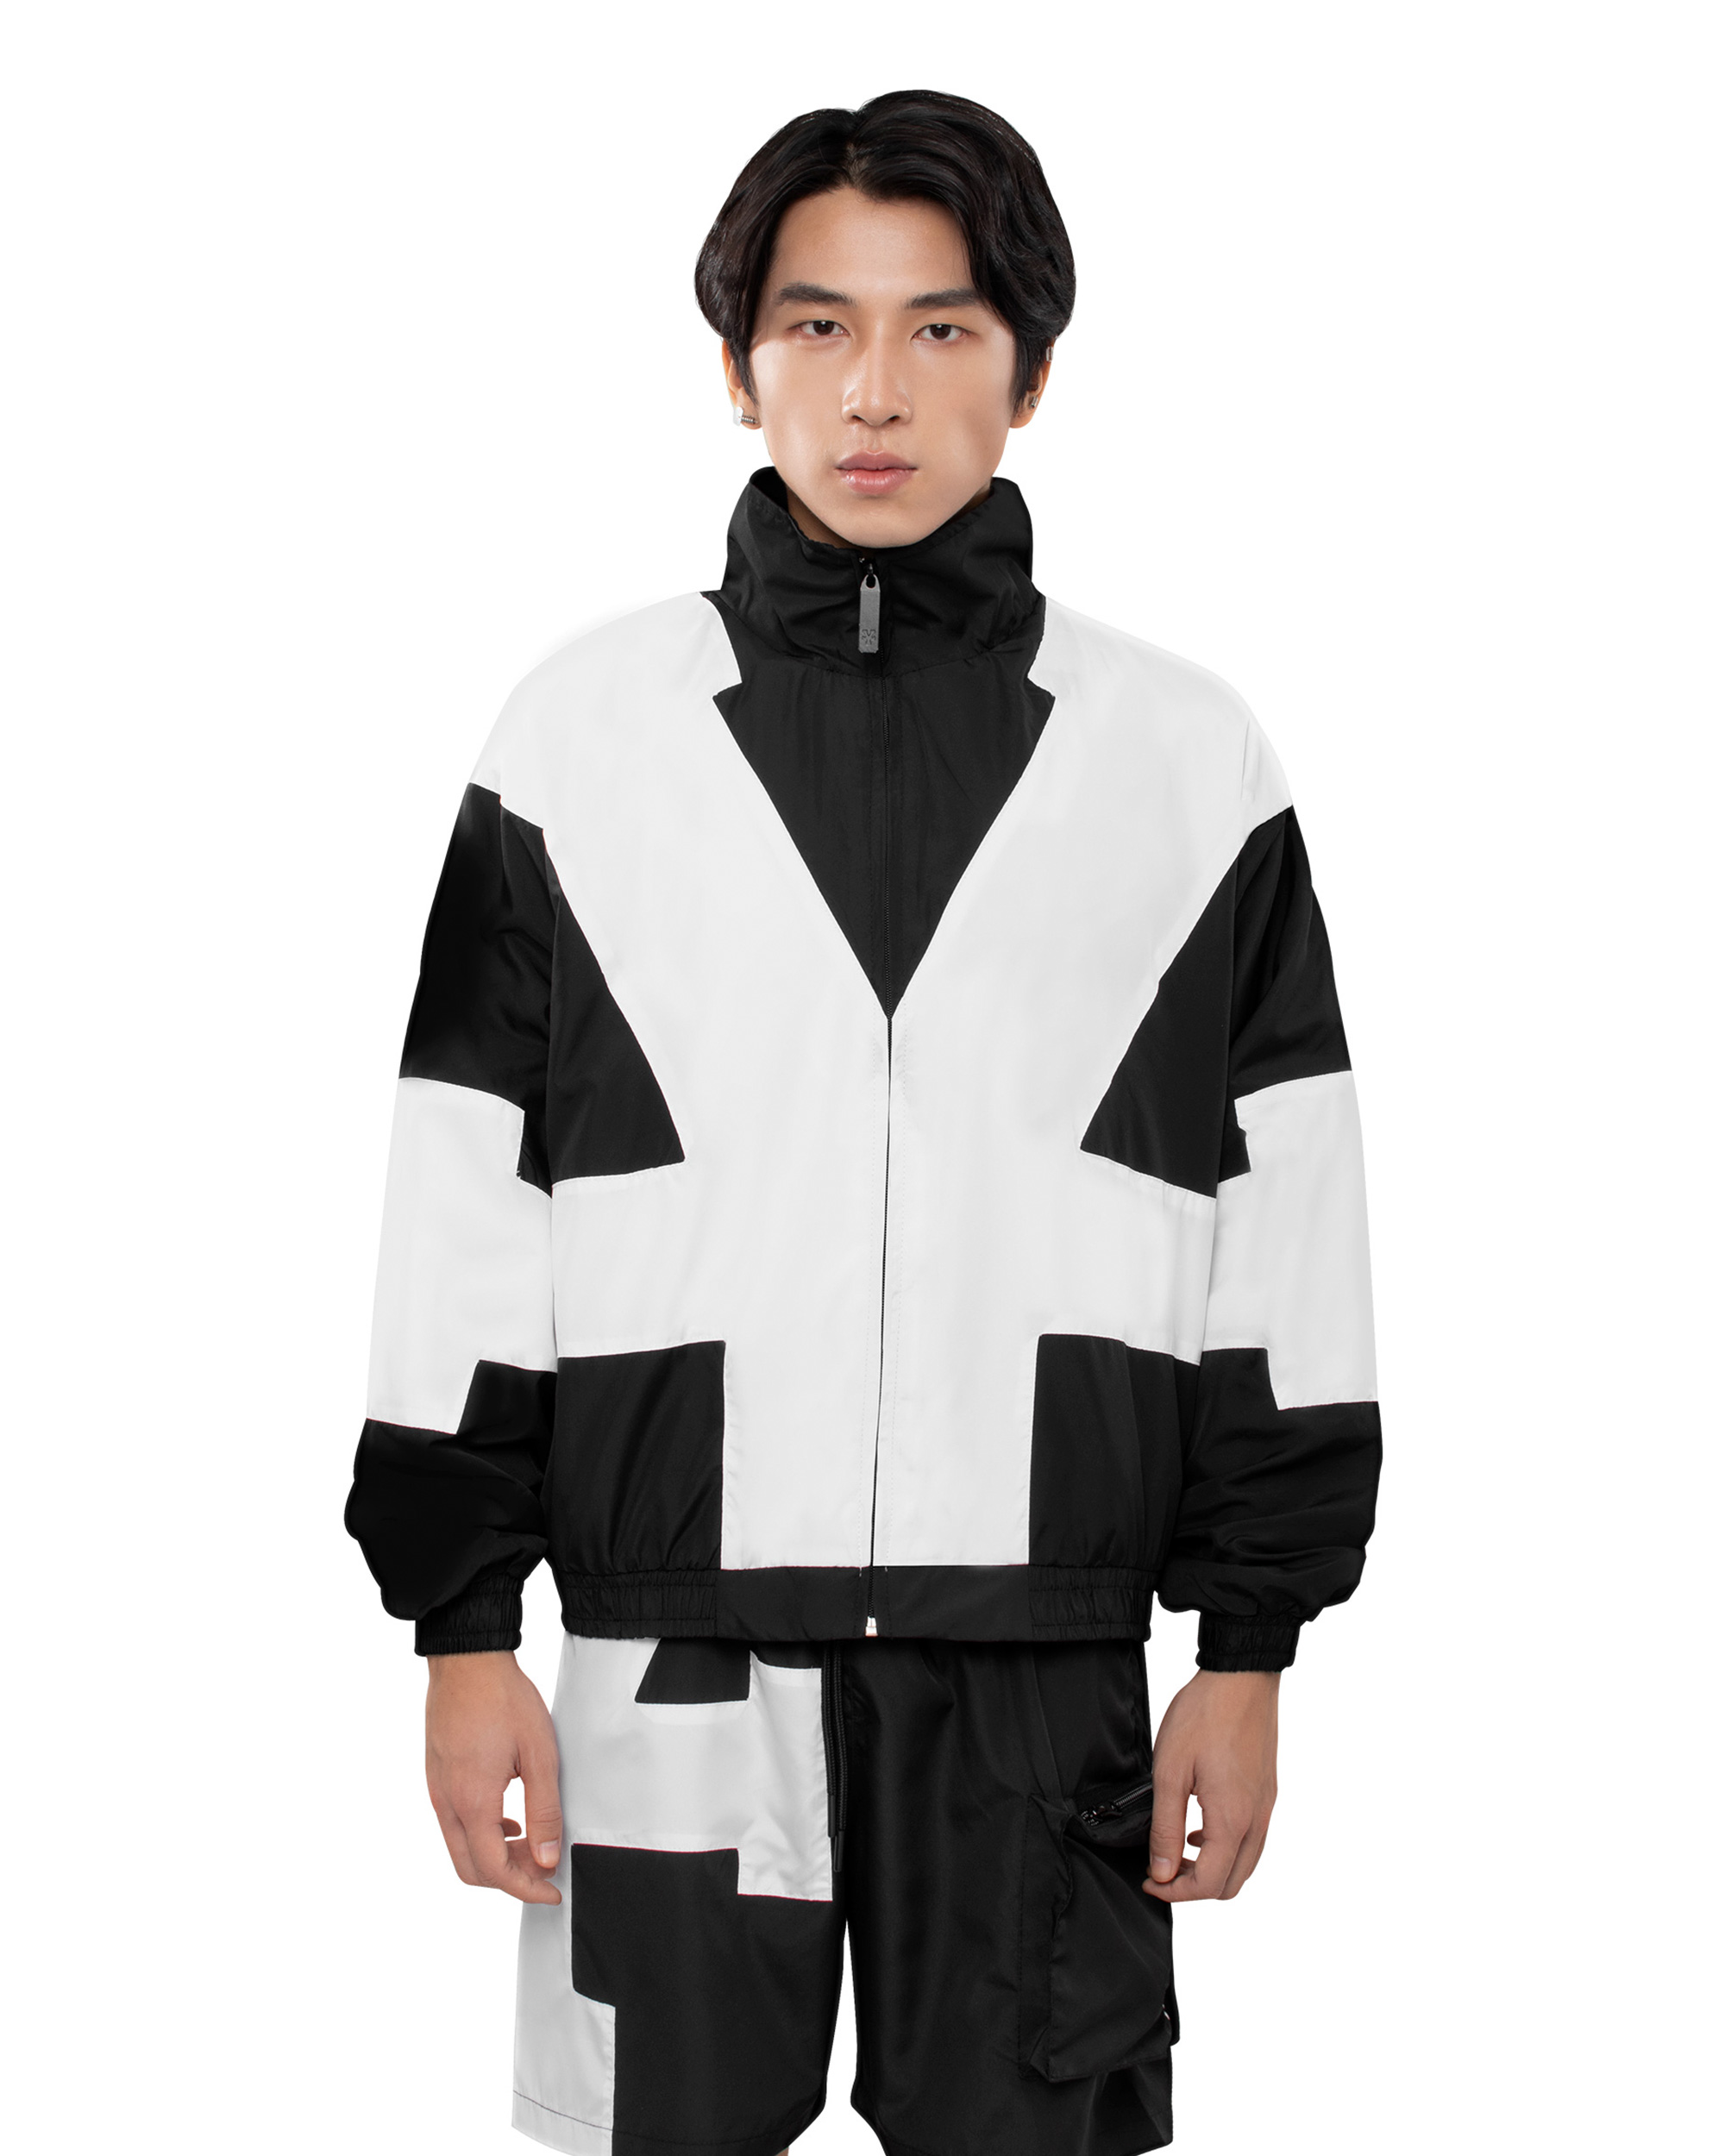 DirtyCoins Big Logo Jacket - Black/White